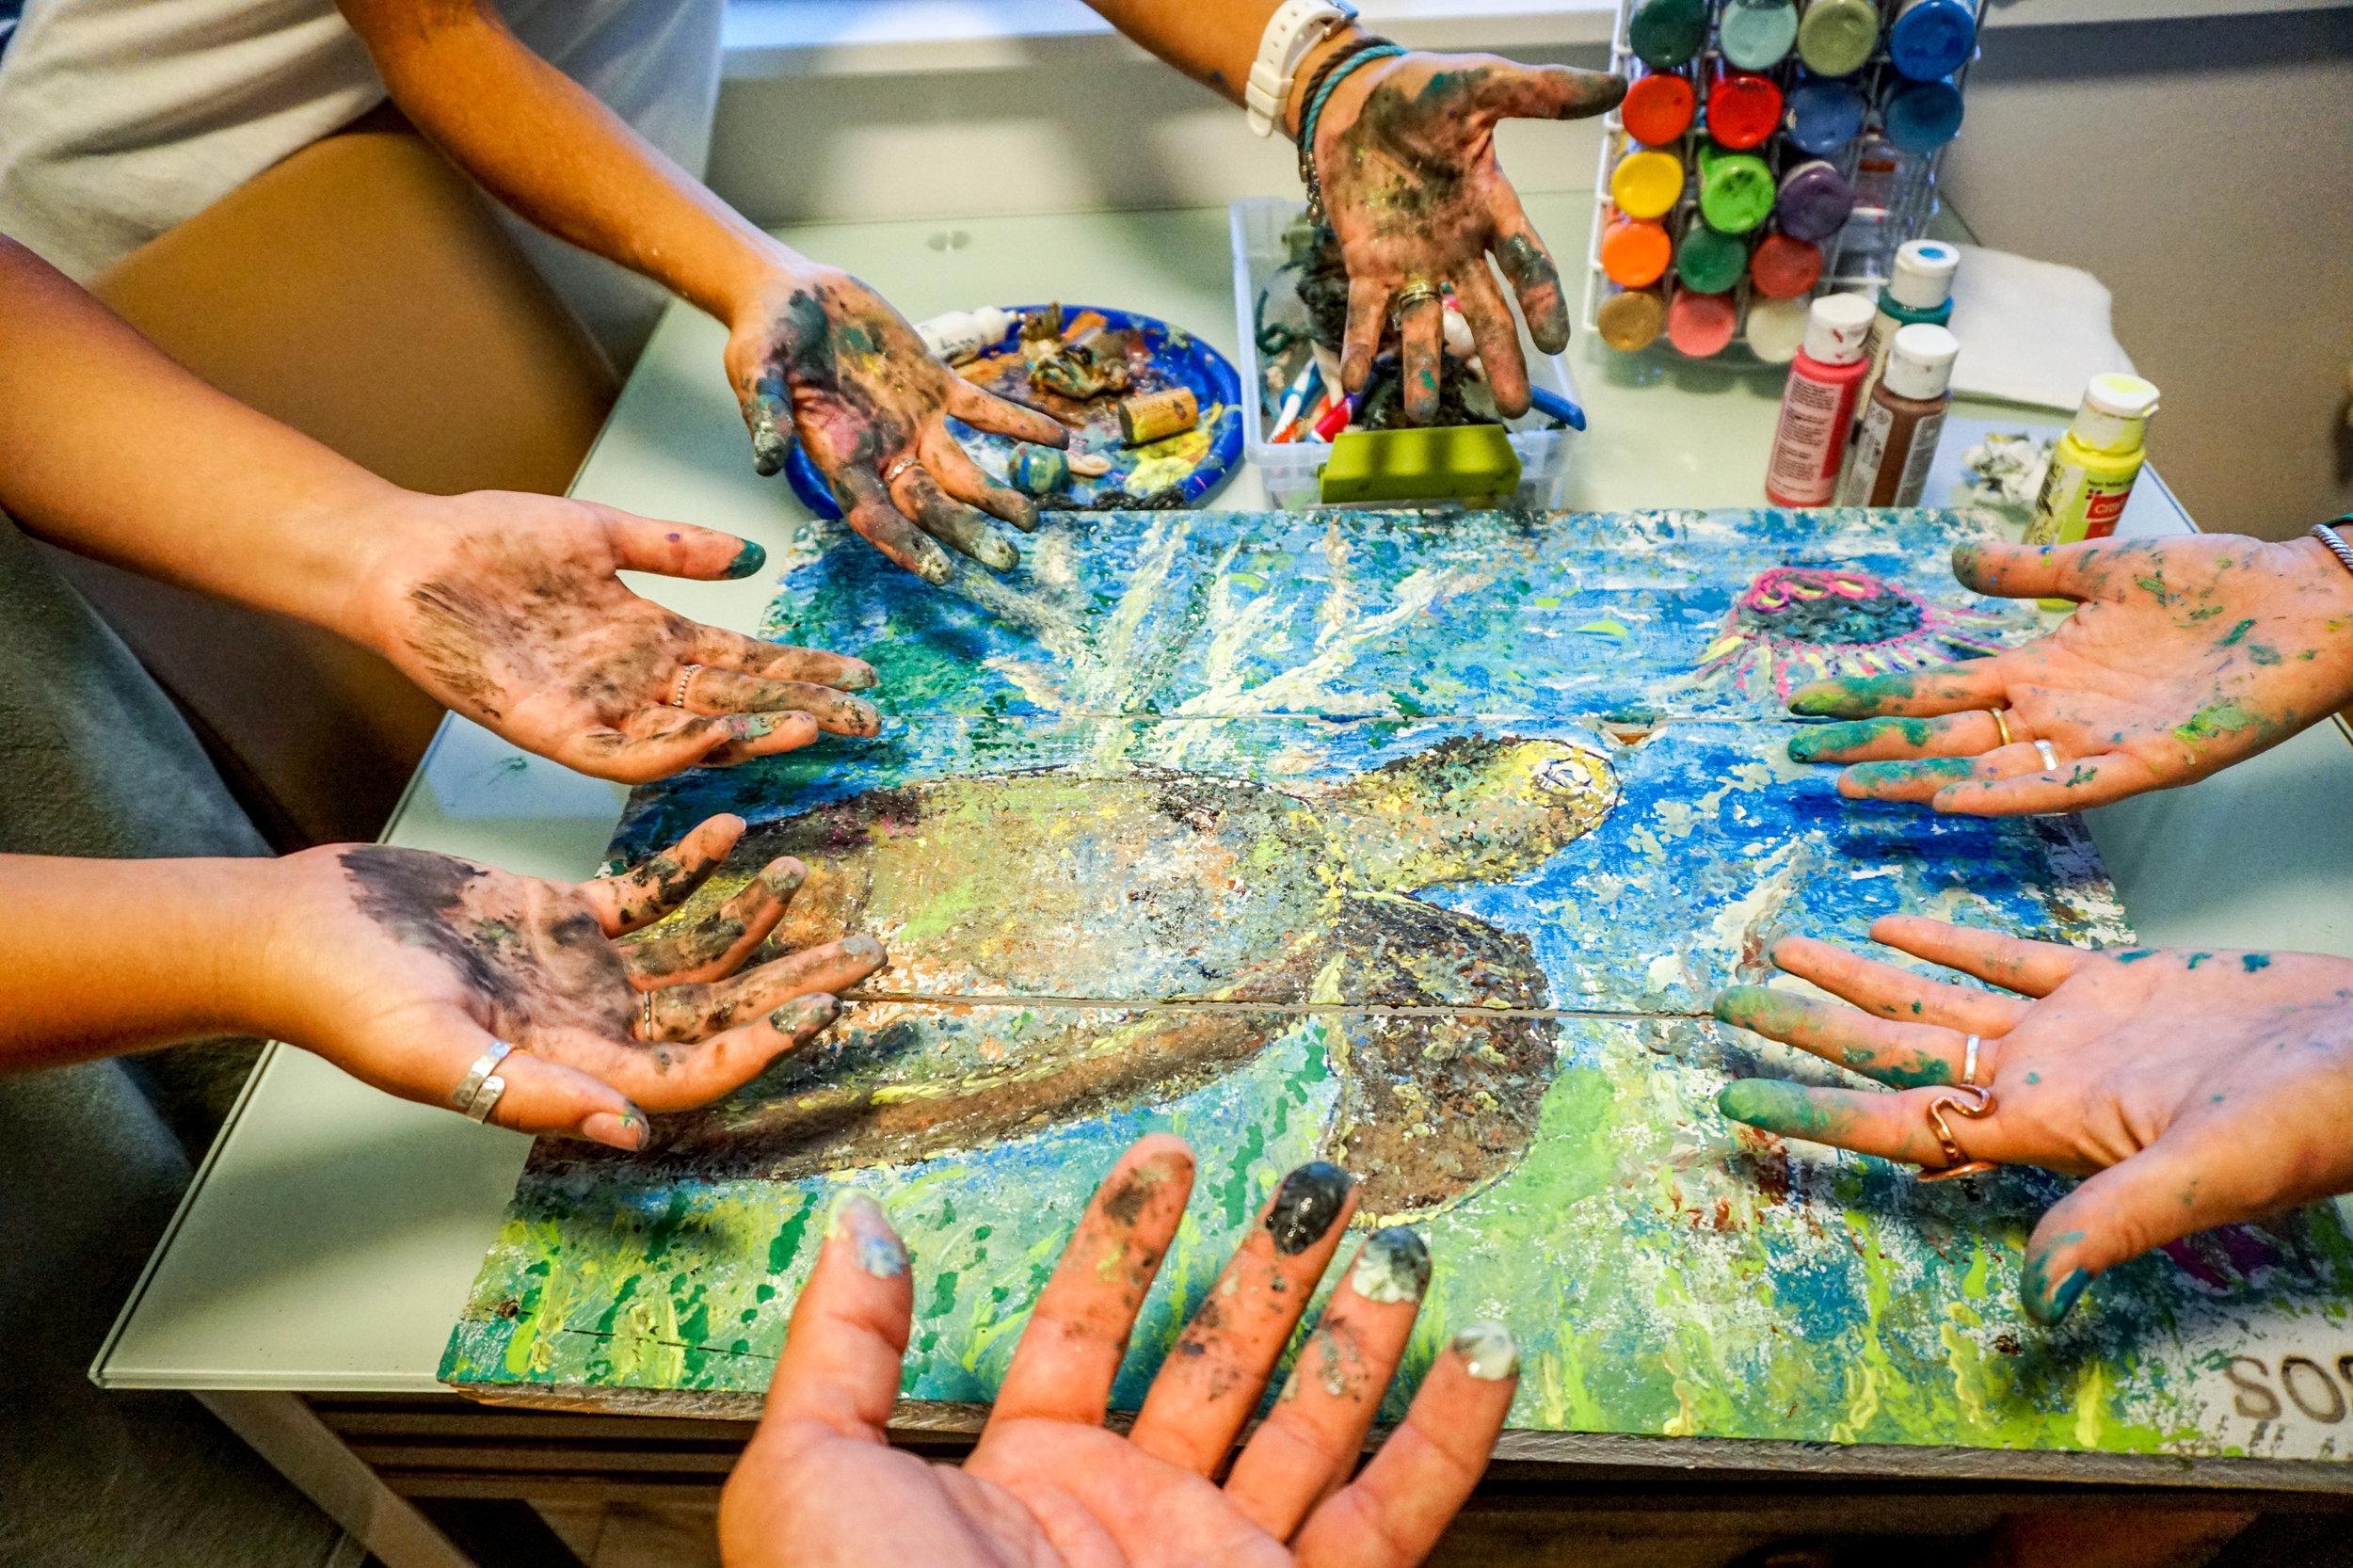 olapi-creative-blue-business-spotlight-sos-lisa-miceli-hands